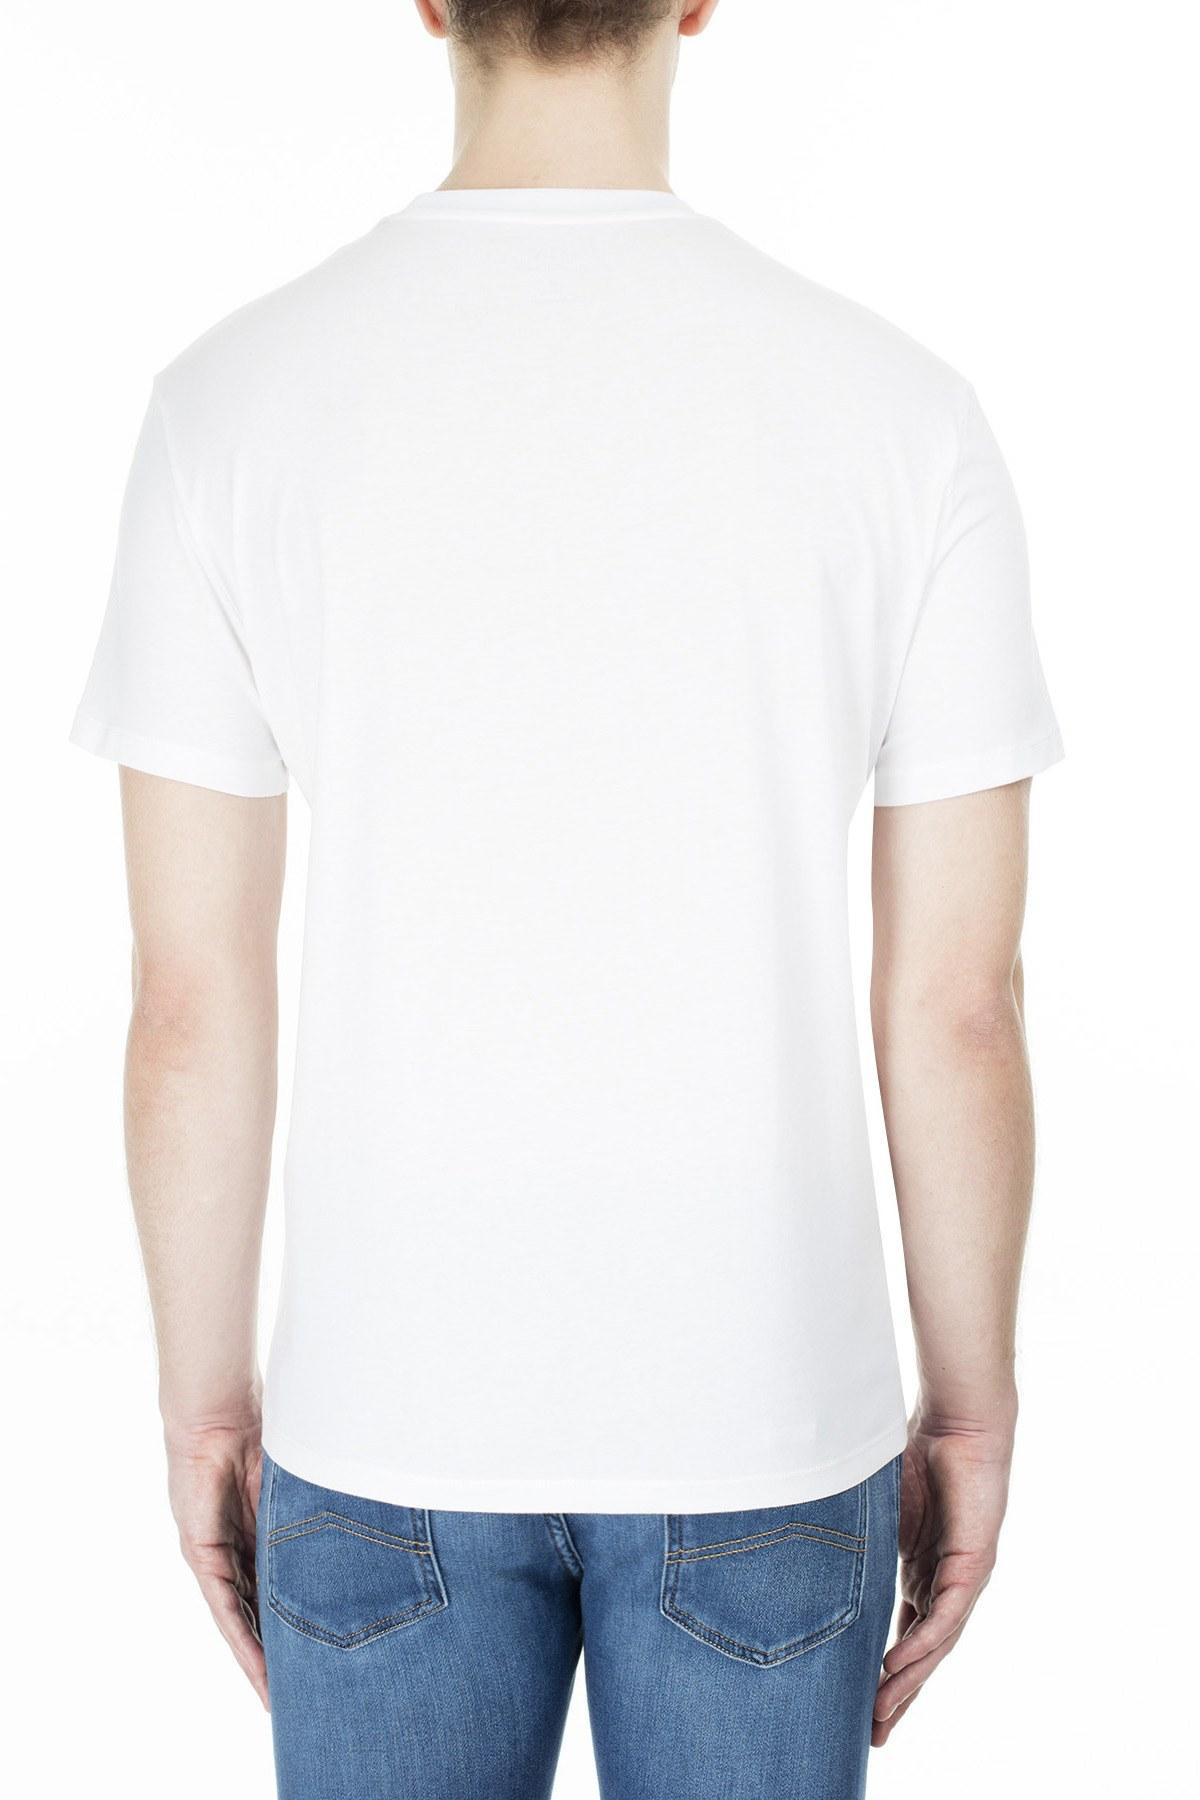 Armani Exchange Erkek T Shirt 3HZTHM ZJ5EZ 1100 BEYAZ